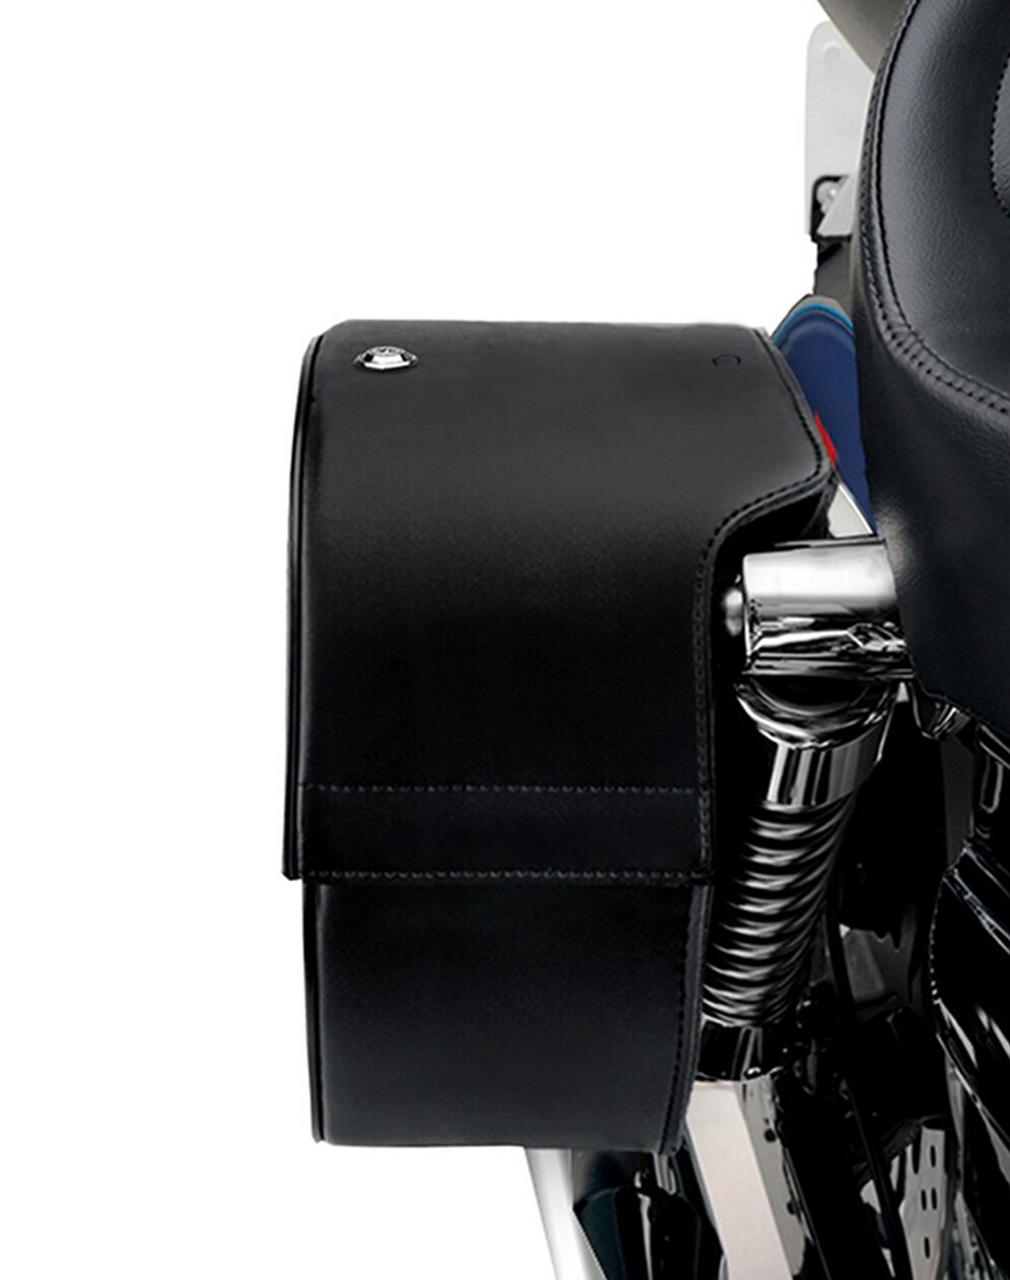 Kawasaki 1600 Mean Streak Shock Cutout Warrior Slanted Large Motorcycle Saddlebags Shock Cutout View